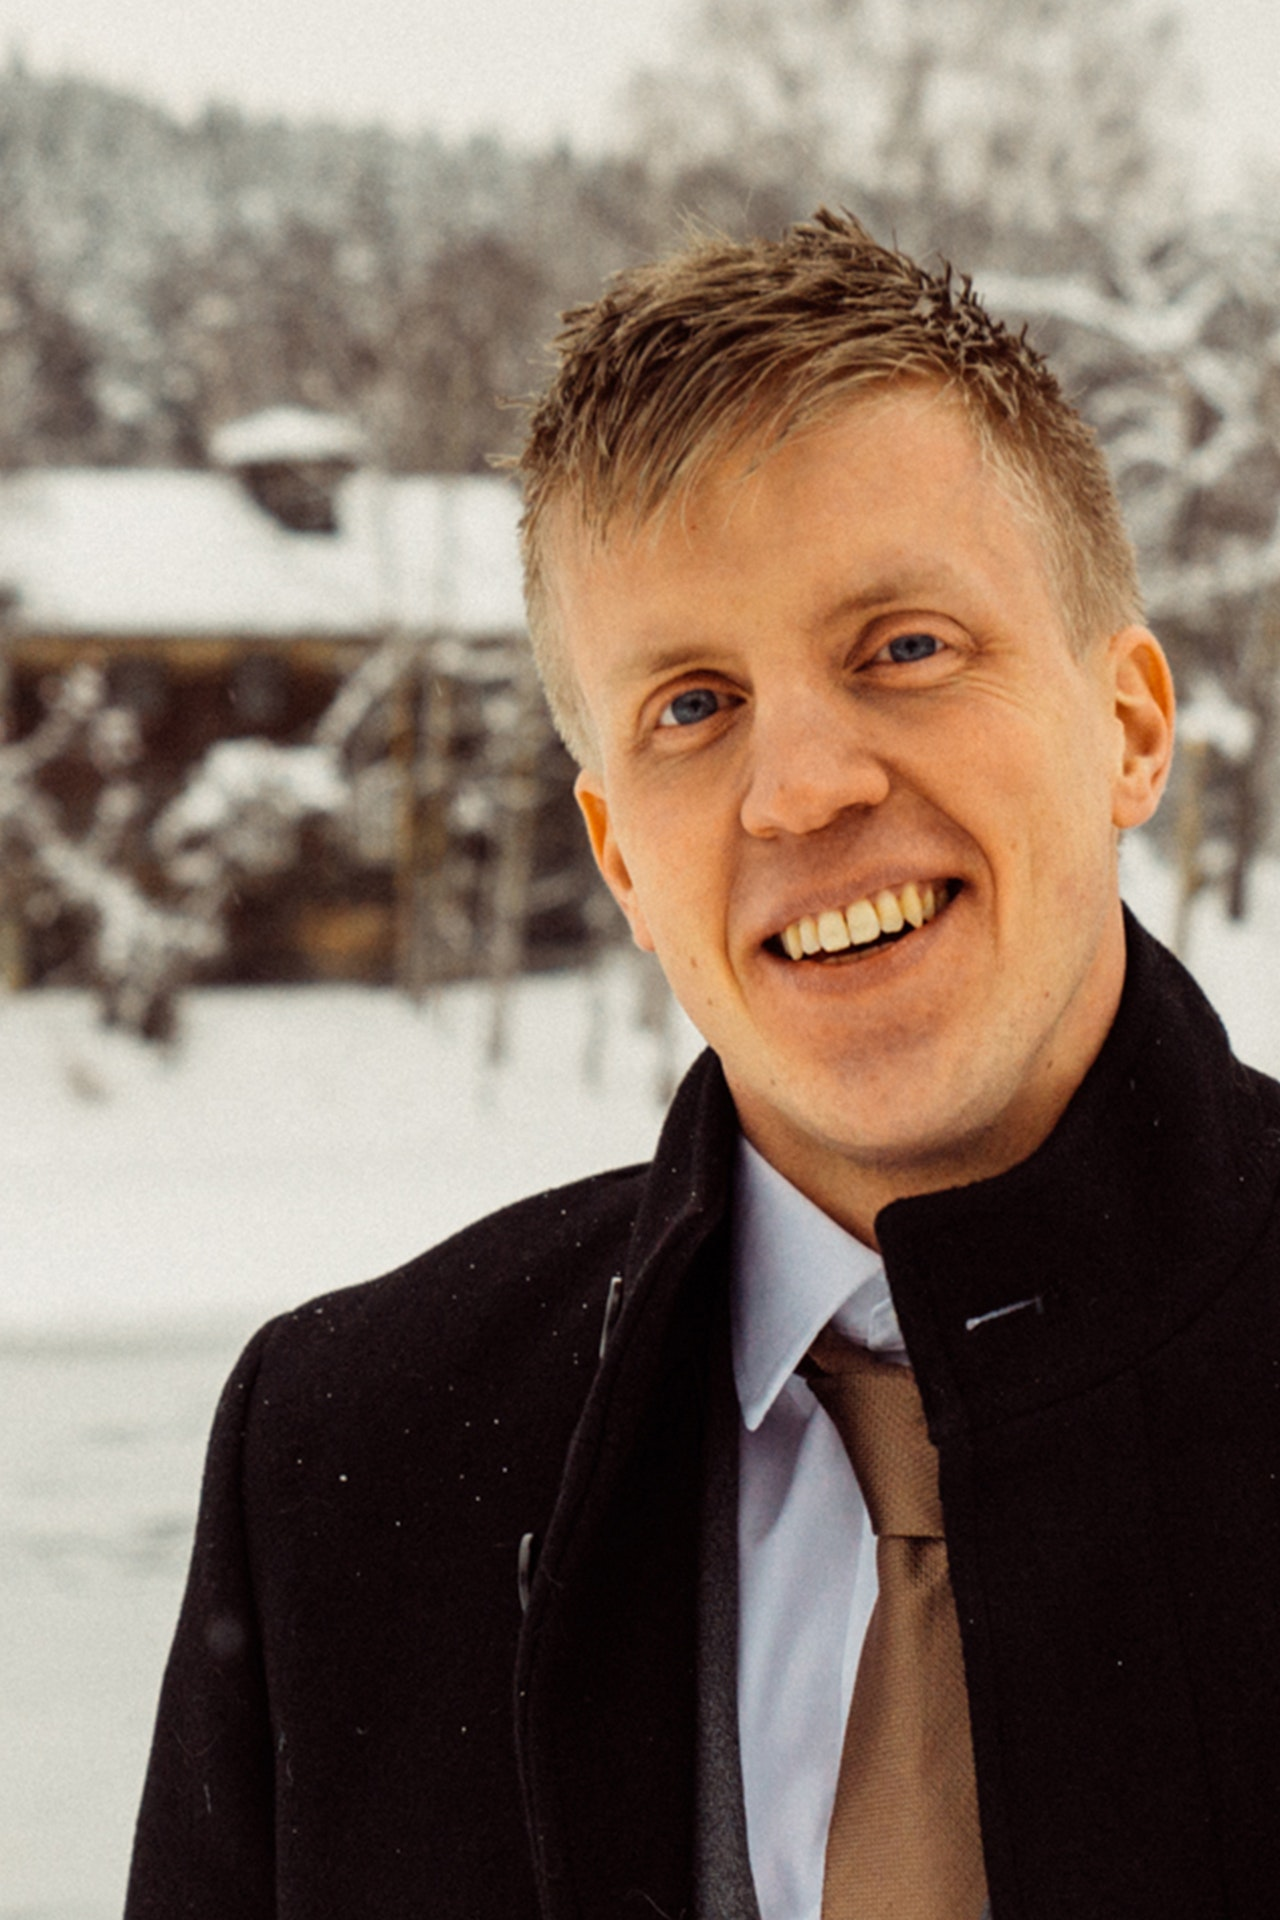 Emanuel Nilsson